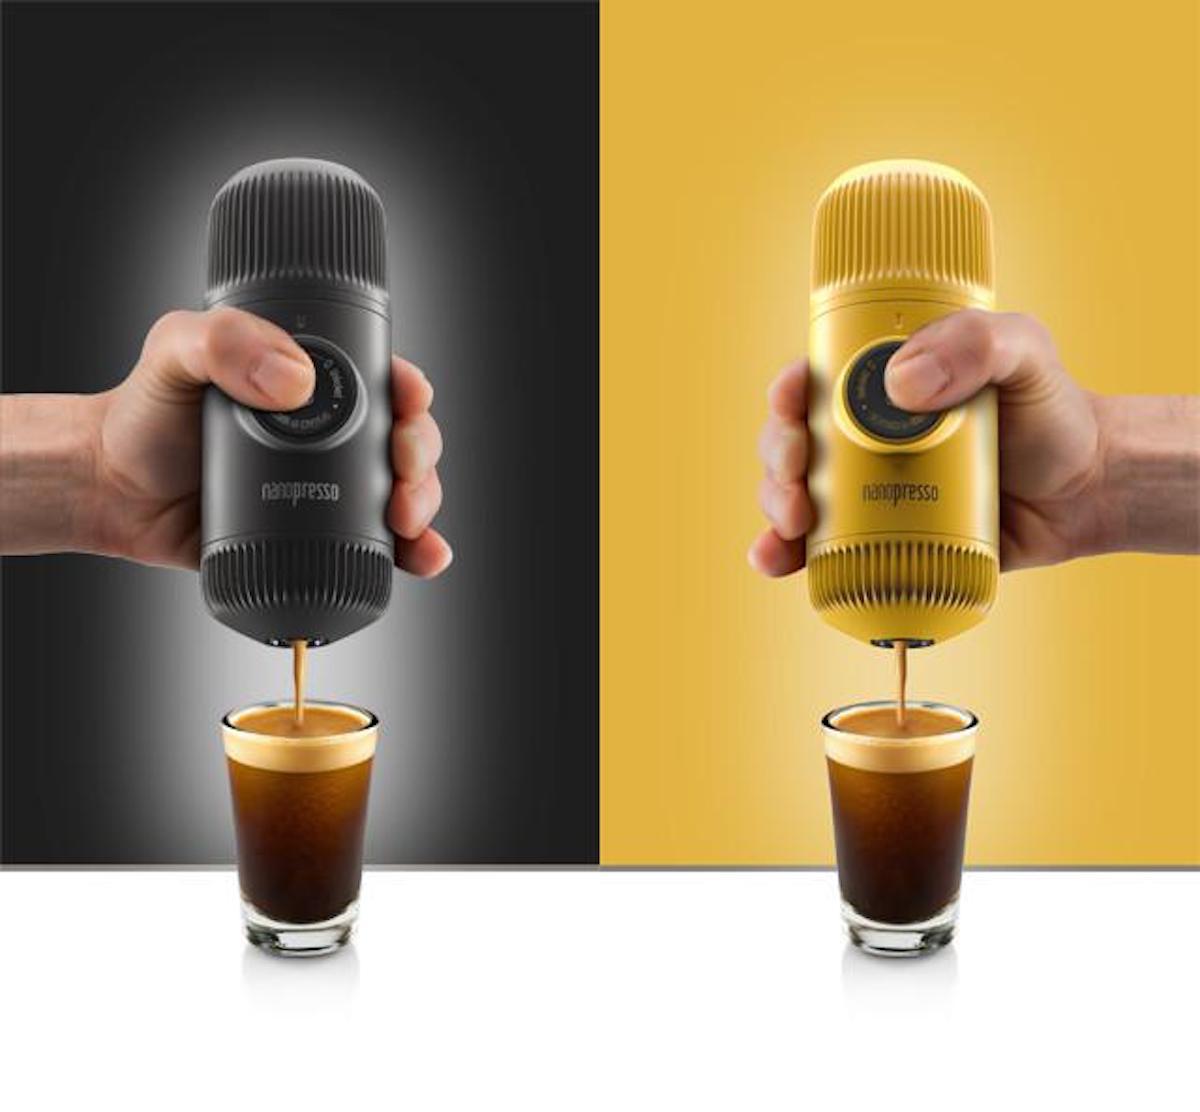 best portable espresso maker: Nanopresso